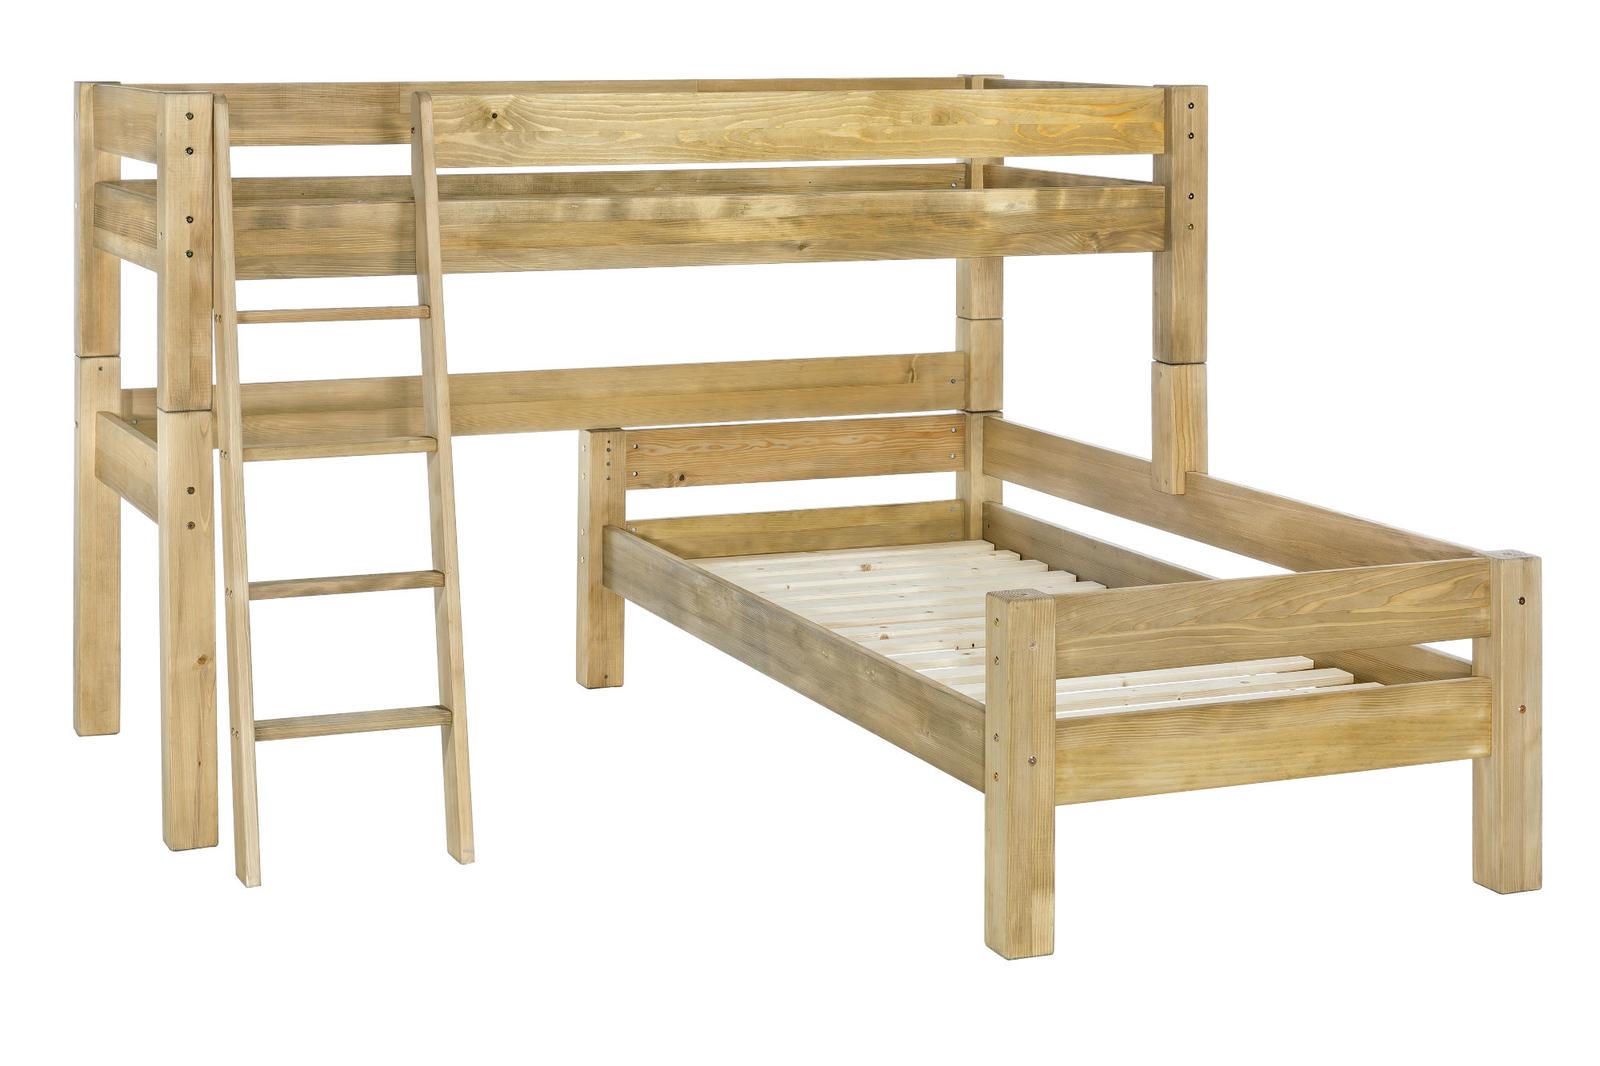 Fantastisch Doppelhochbett Rahmen Galerie - Rahmen Ideen ...